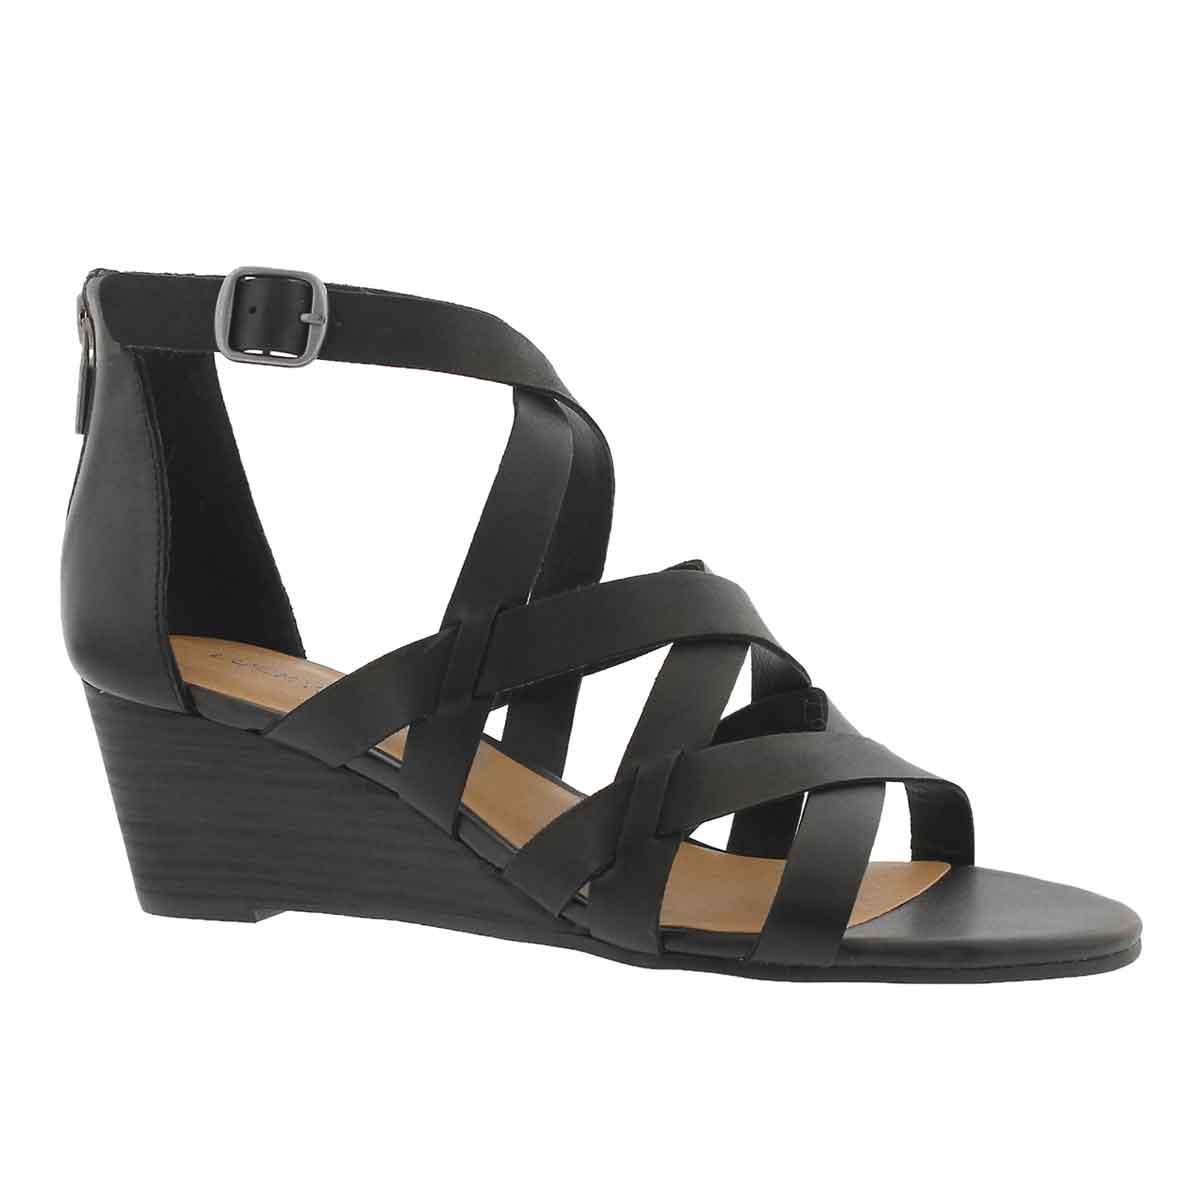 Women's JEWELIA black wedge sandal